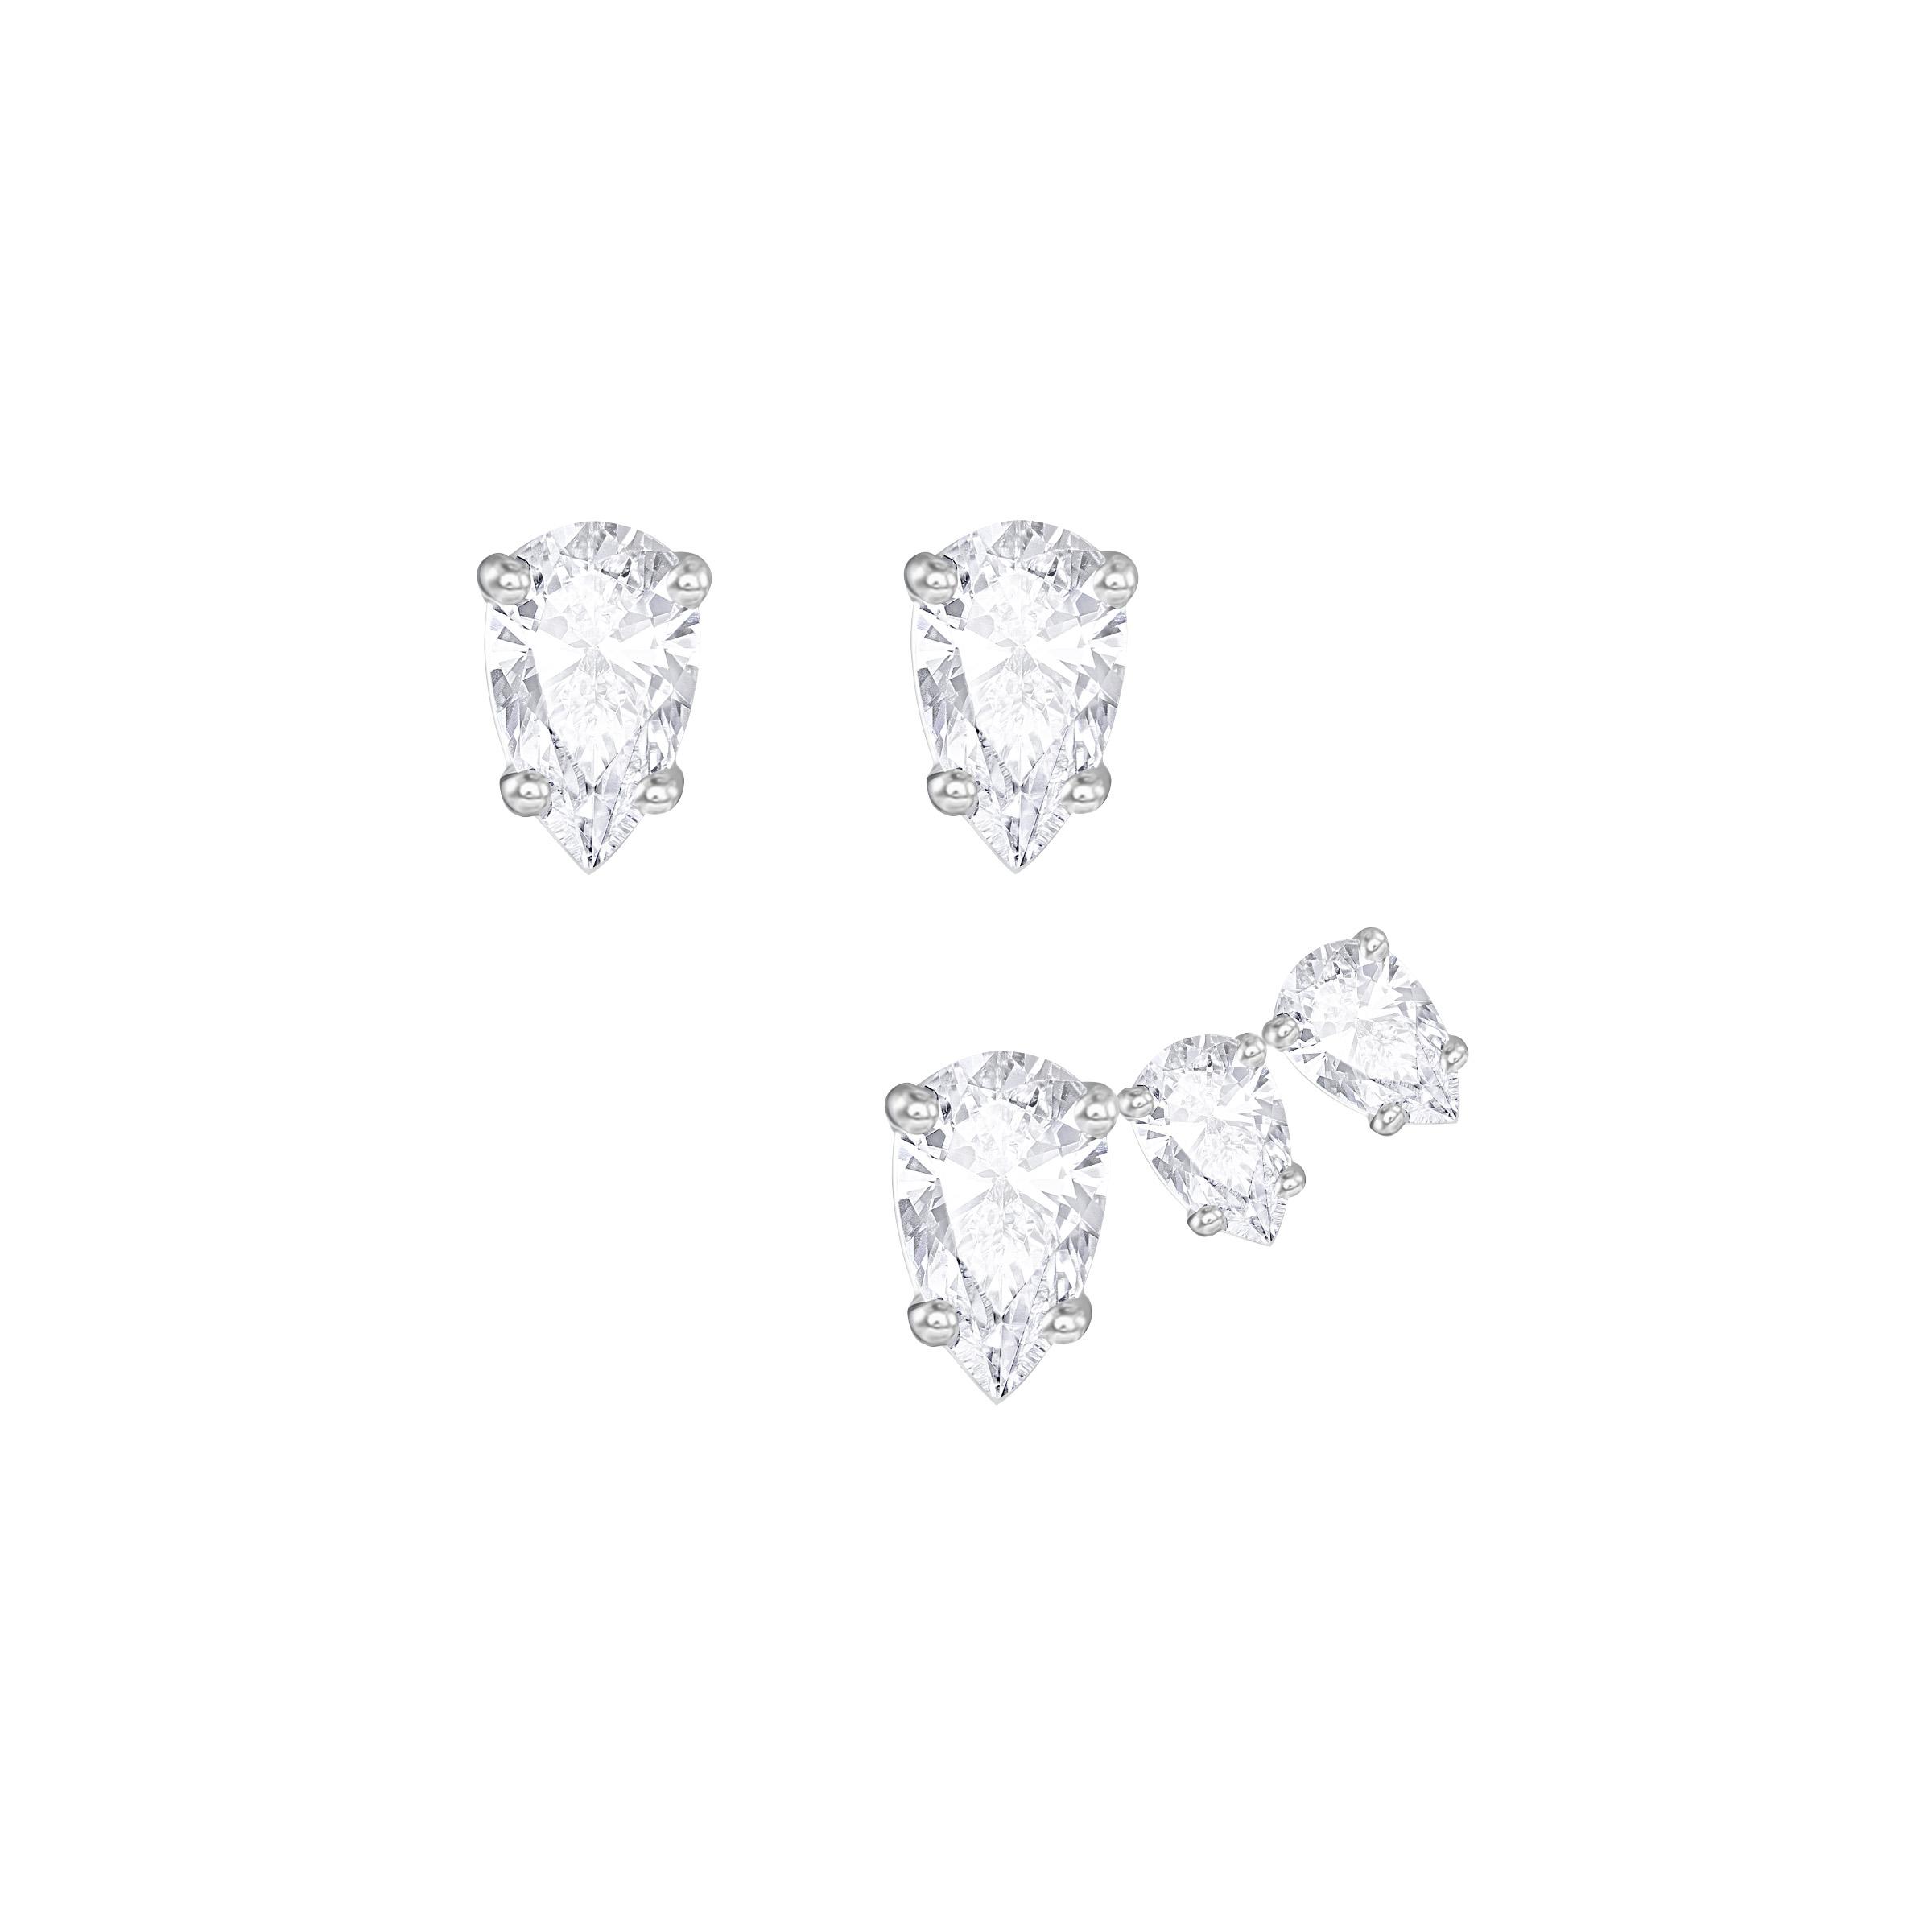 Boucles d'oreilles Swarovski Attract Pear, Blanc, métal rhodié